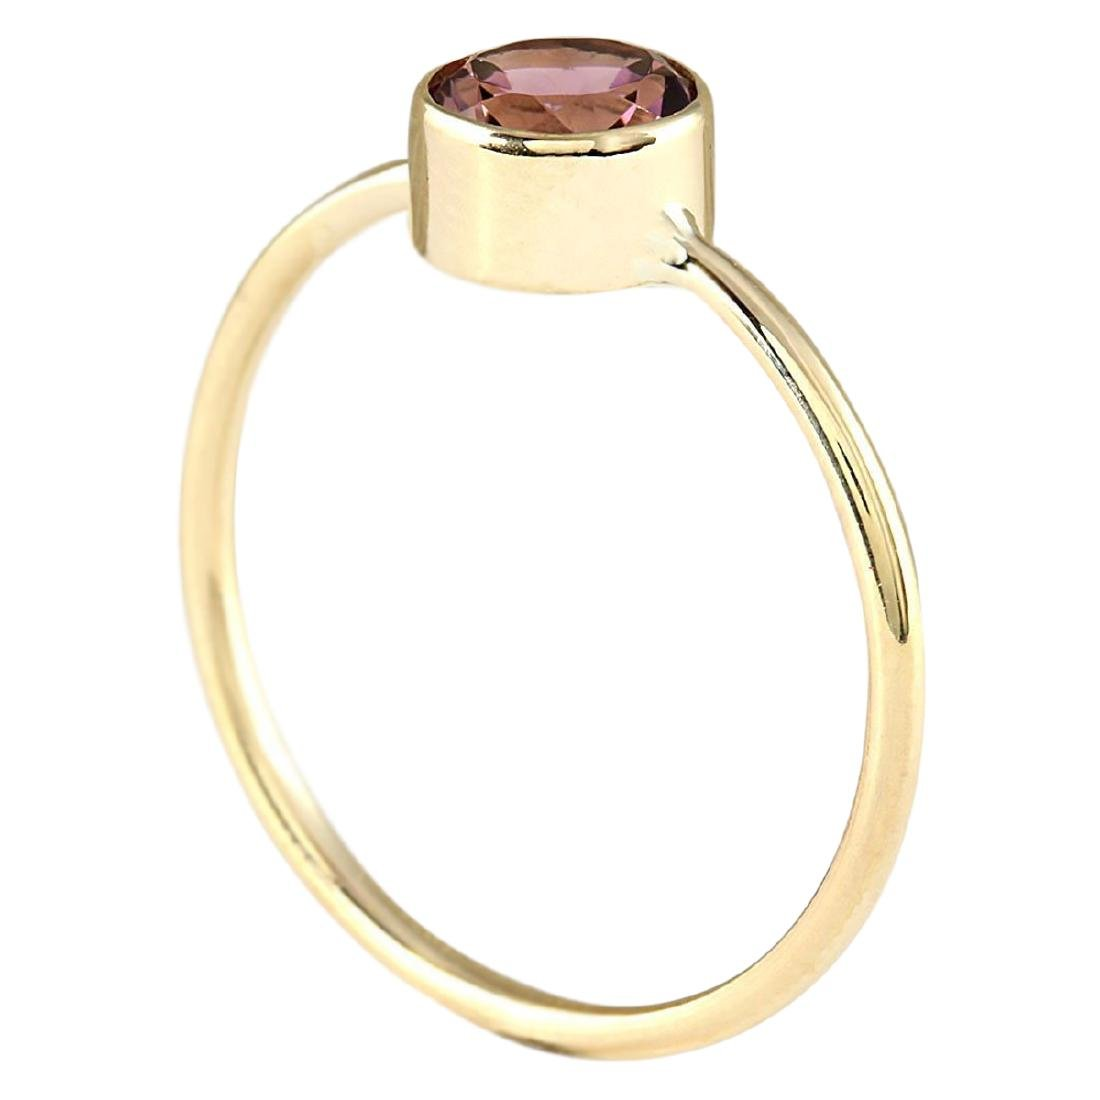 .80 CTW Natural Pink Tourmaline Ring In 18K Yellow Gold - 3